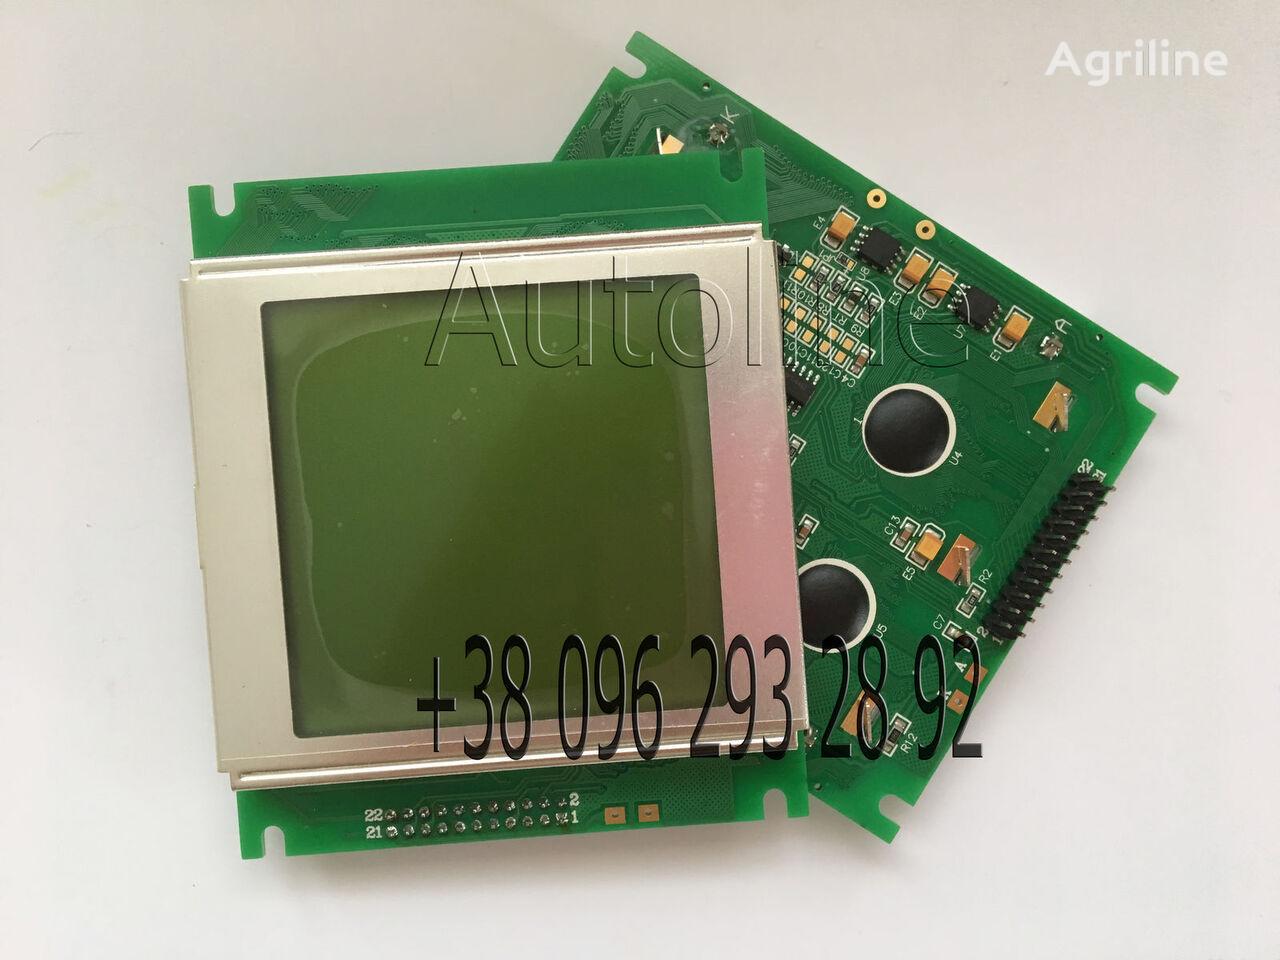 new Ekran dlya SM300, SM400, Challenger 8186 monitor for MASSEY FERGUSON MF-555 seeder